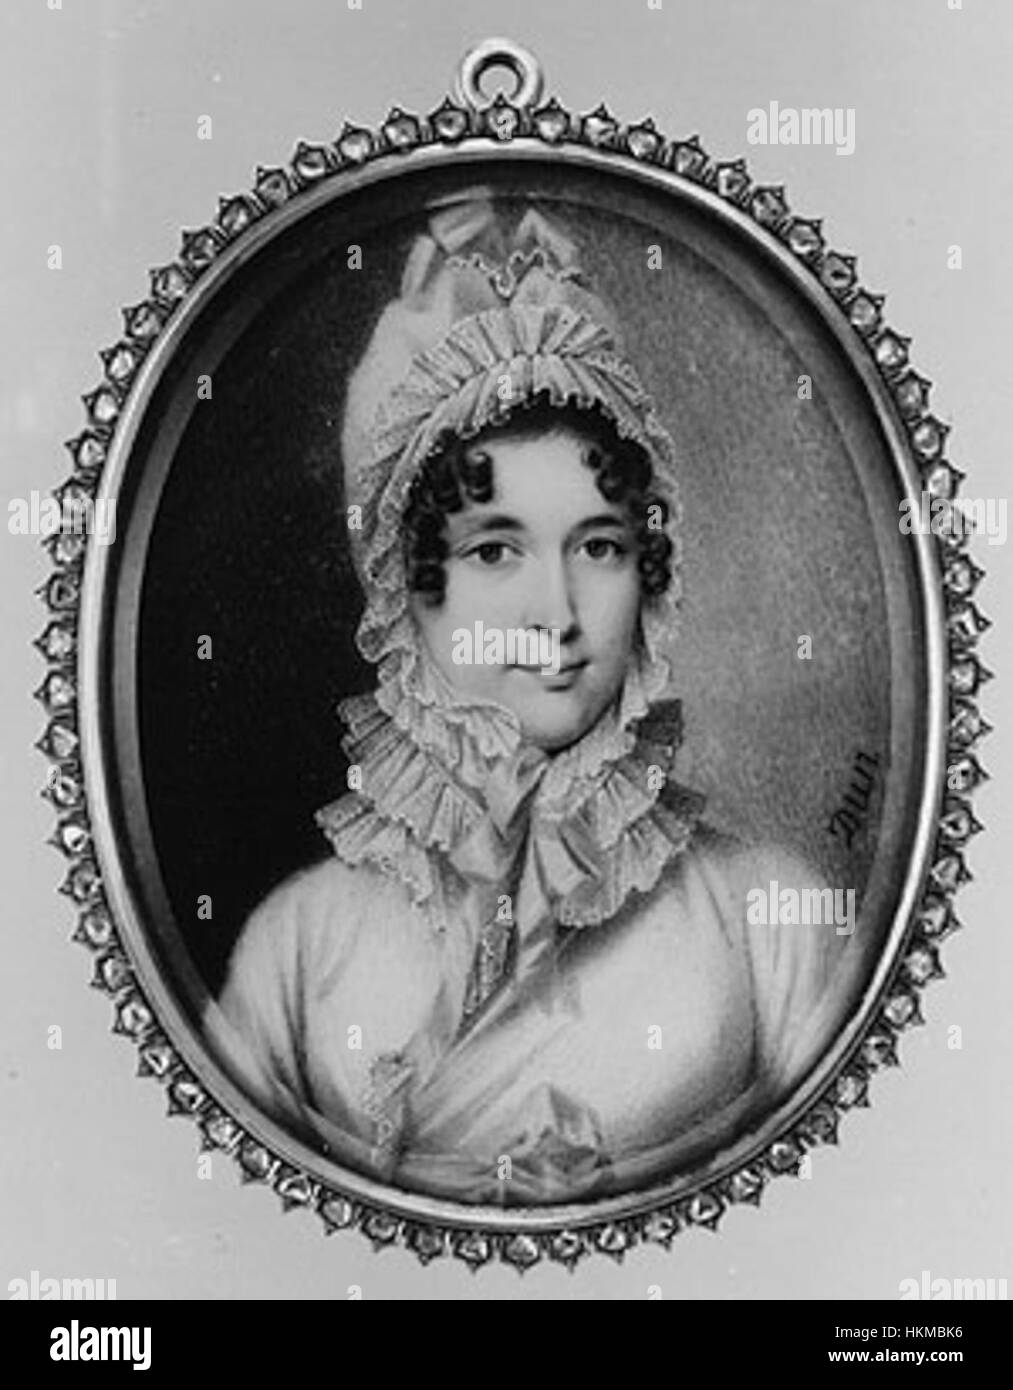 Miniature Mme Recamier 1810s - Stock Image